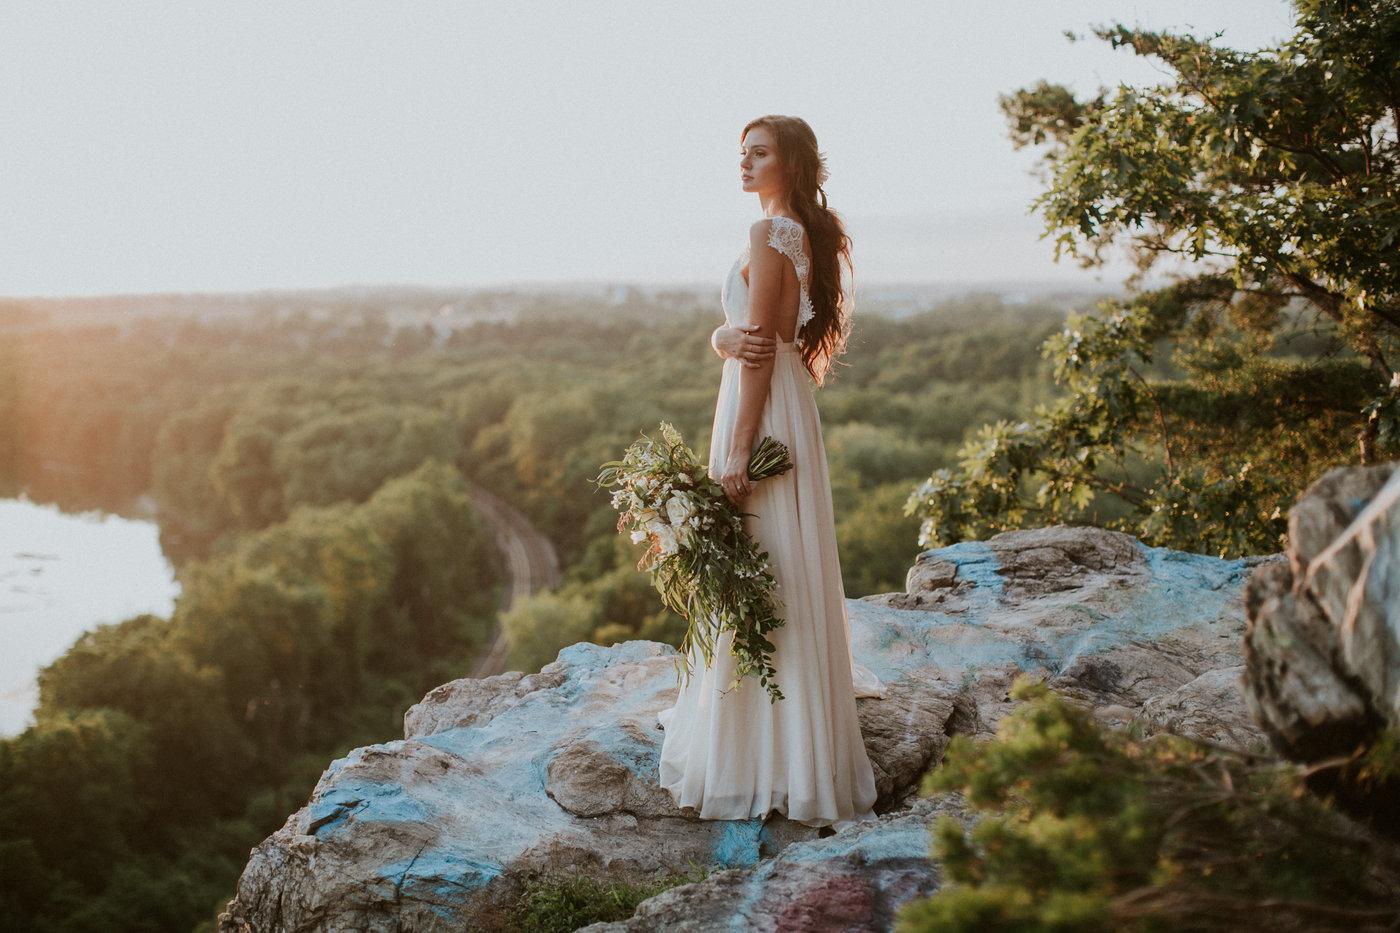 Ethereal Bridal Inspiration-Ethereal Bridal Inspiration-0124.jpg